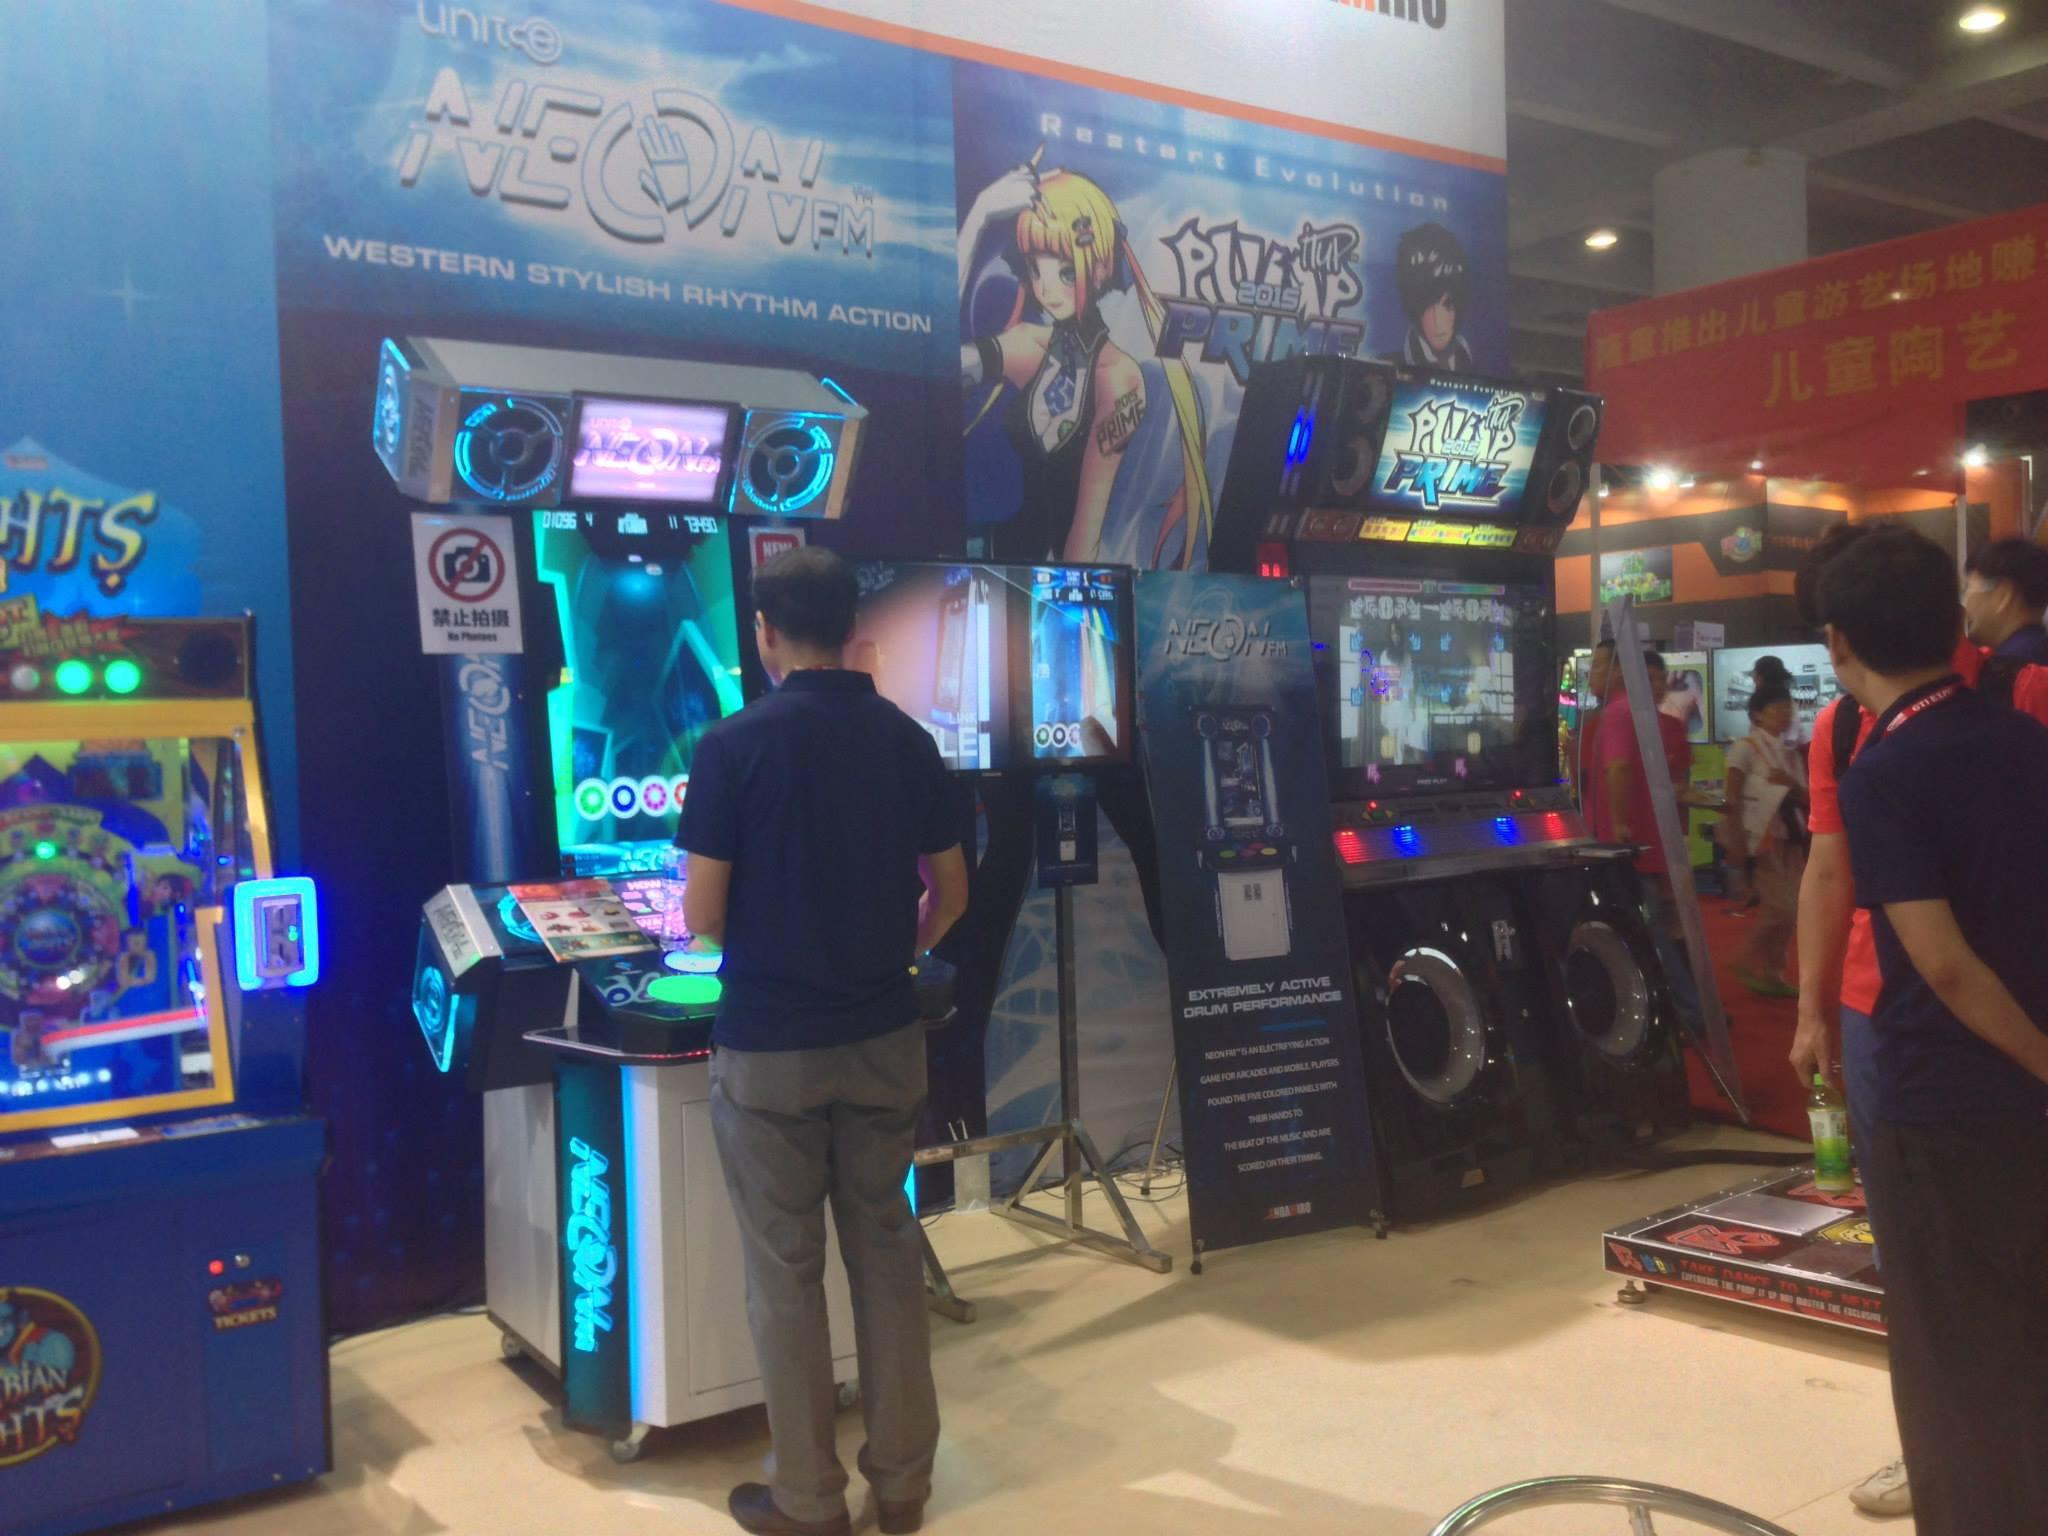 Star Wars Cabinet Arcade Heroes Newsbytes China Expo Arcade Music Vid Name That